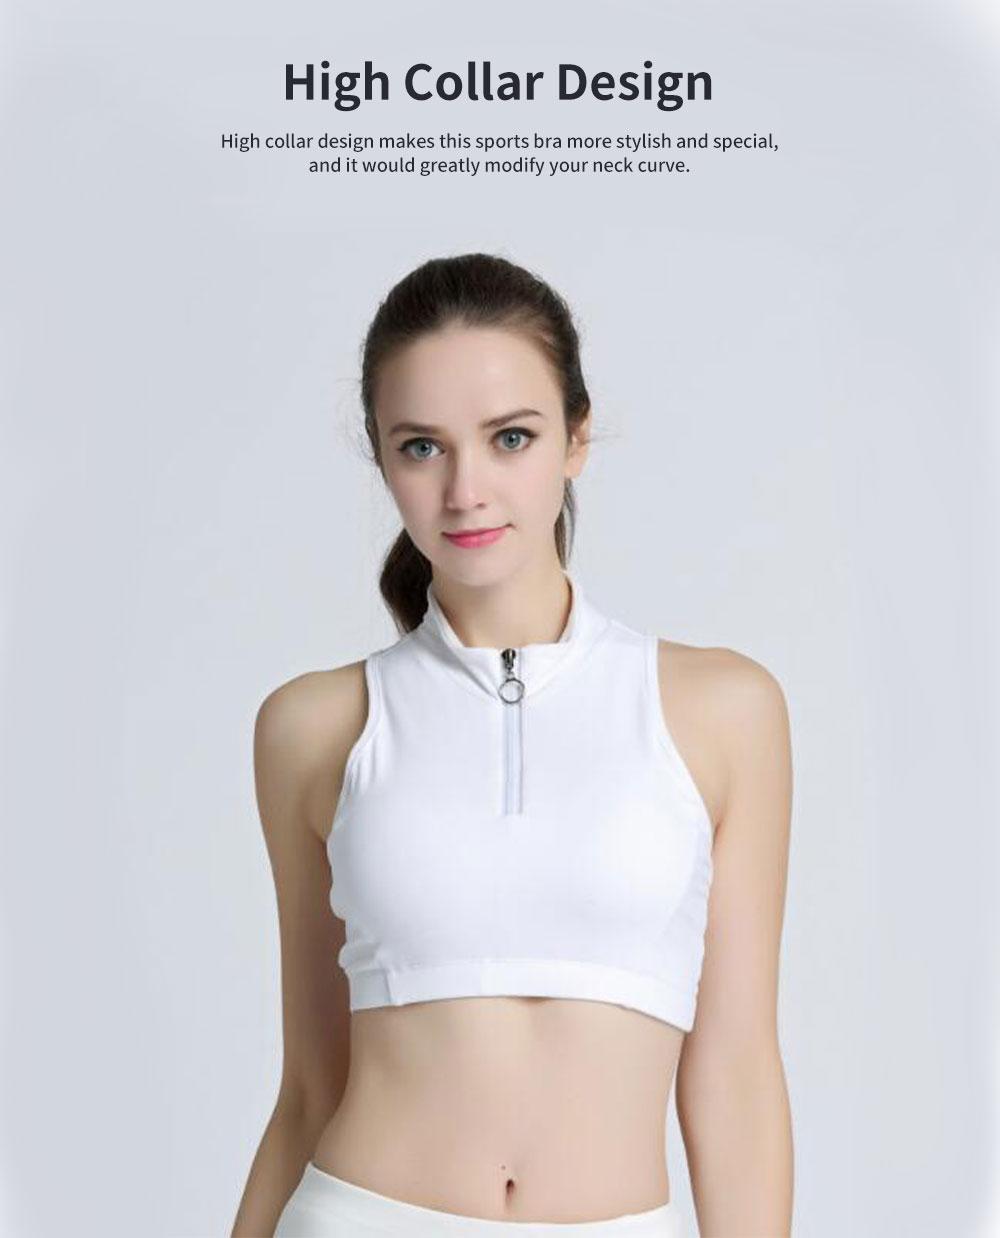 Minimalist High Collar Zipper Yoga Sports Bra for Ladies Fashion Comfortable Quick-dry Athletic Undergarment 2